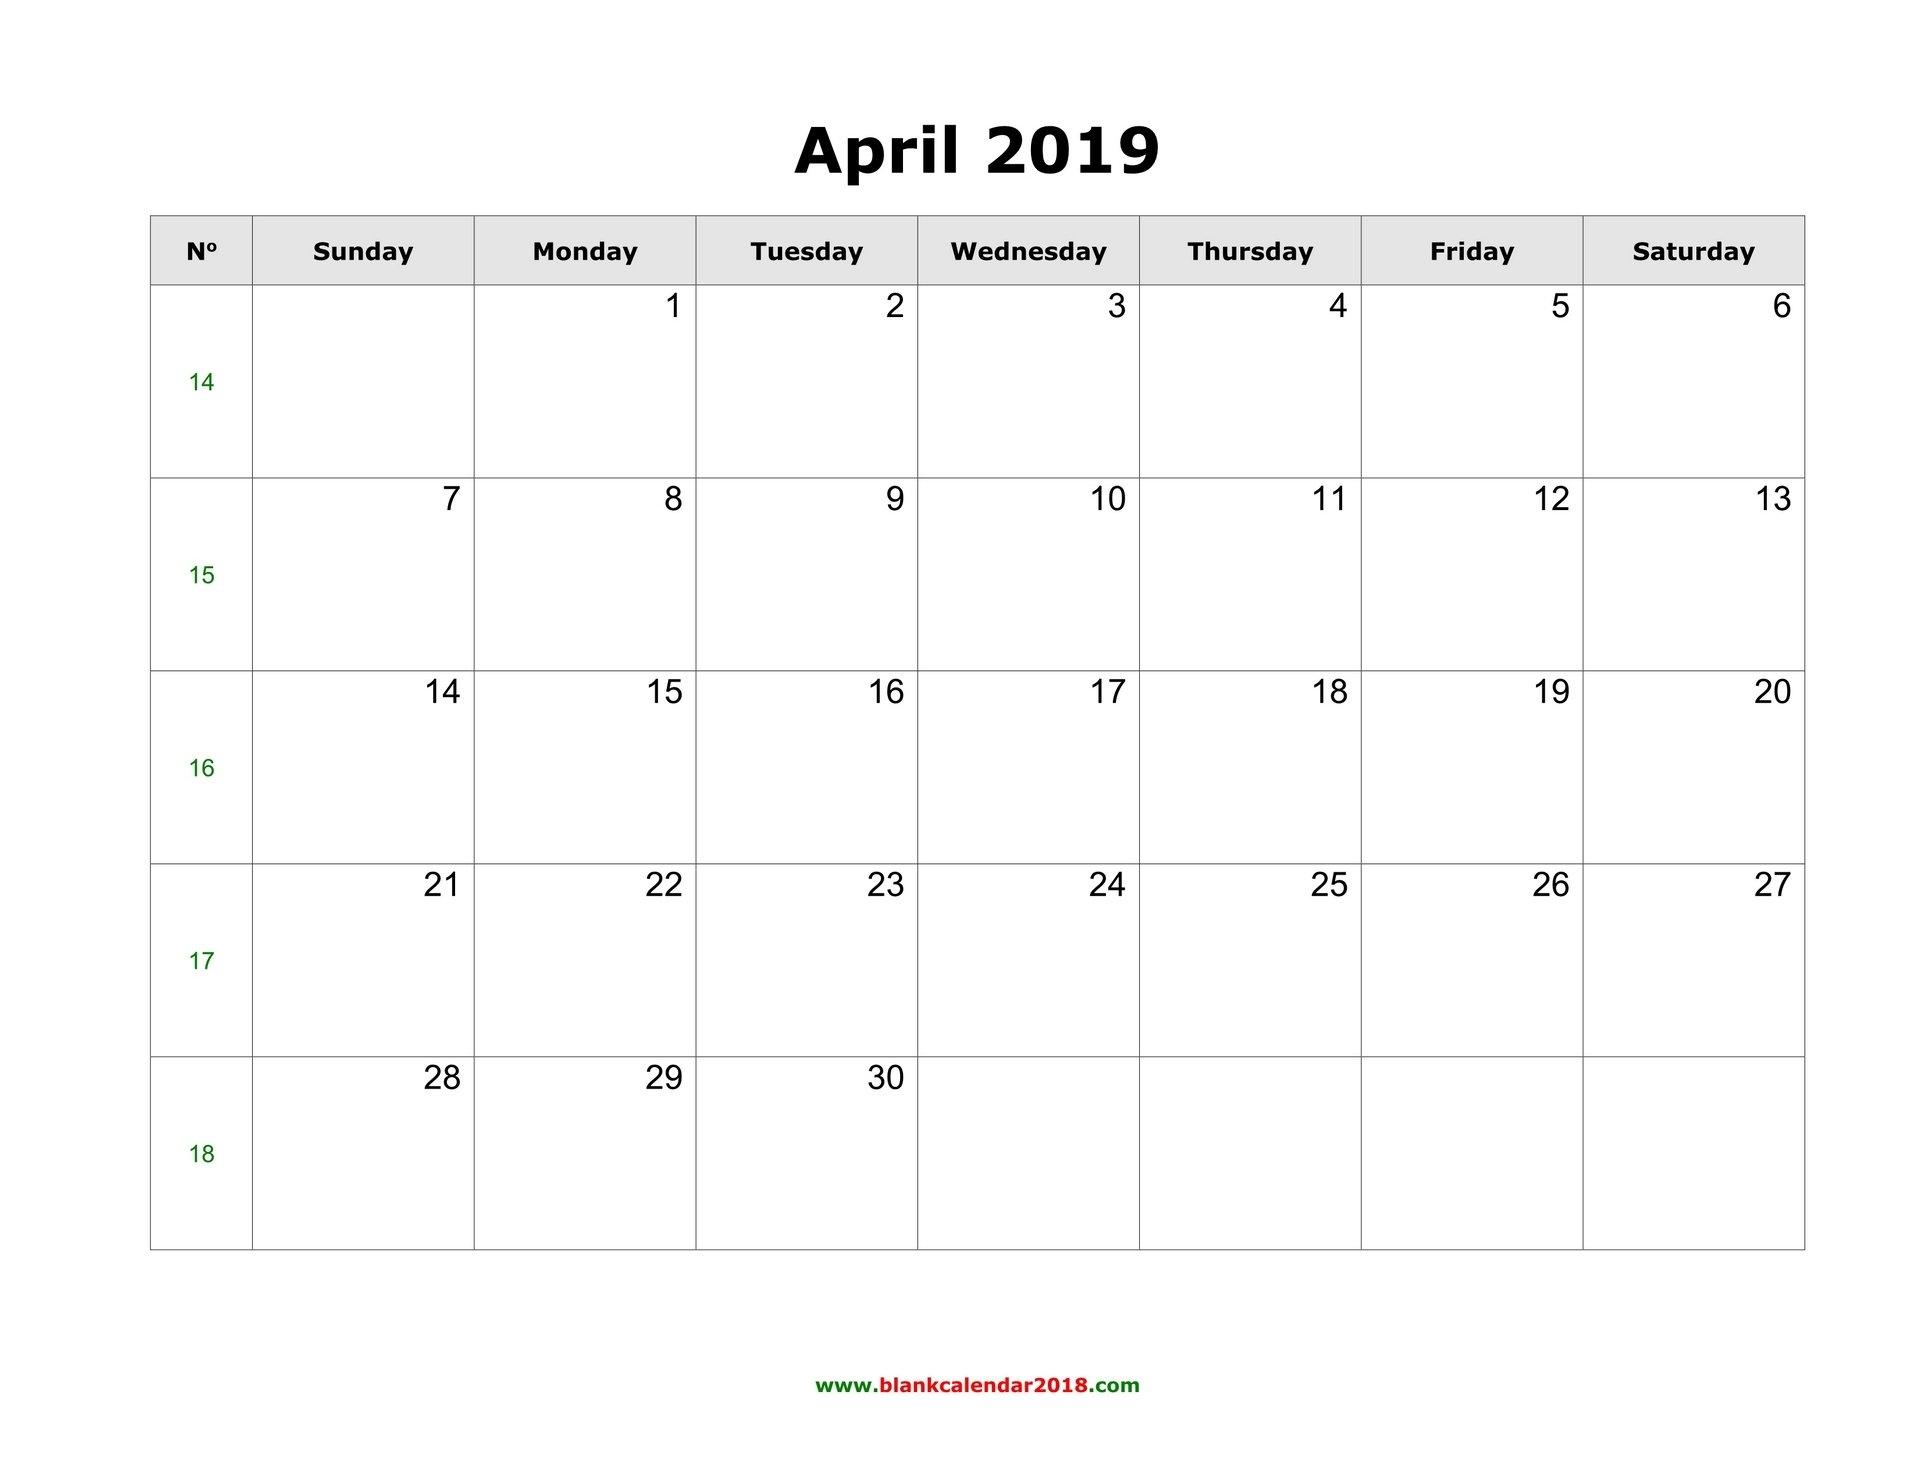 Blank Calendar For April 2019 Calendar Of 2019 April